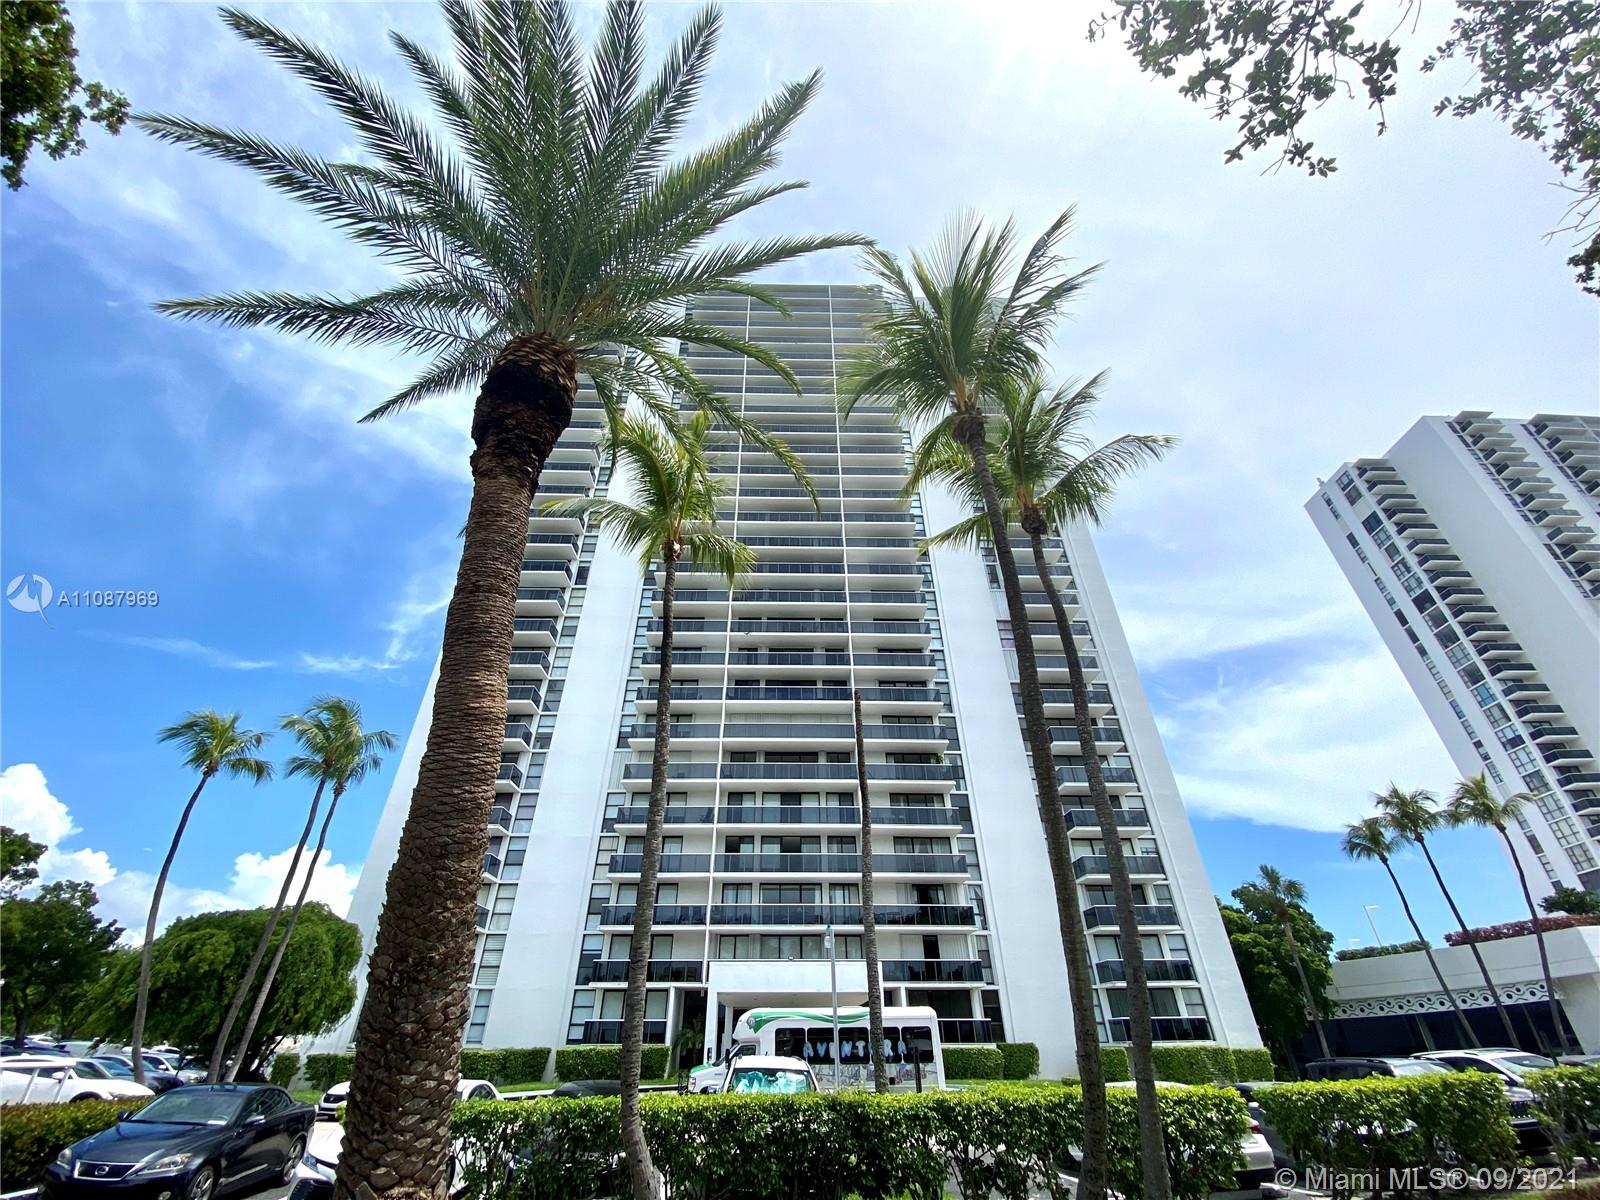 Eldorado Tower One #210 - 3625 N Country Club Dr #210, Aventura, FL 33180